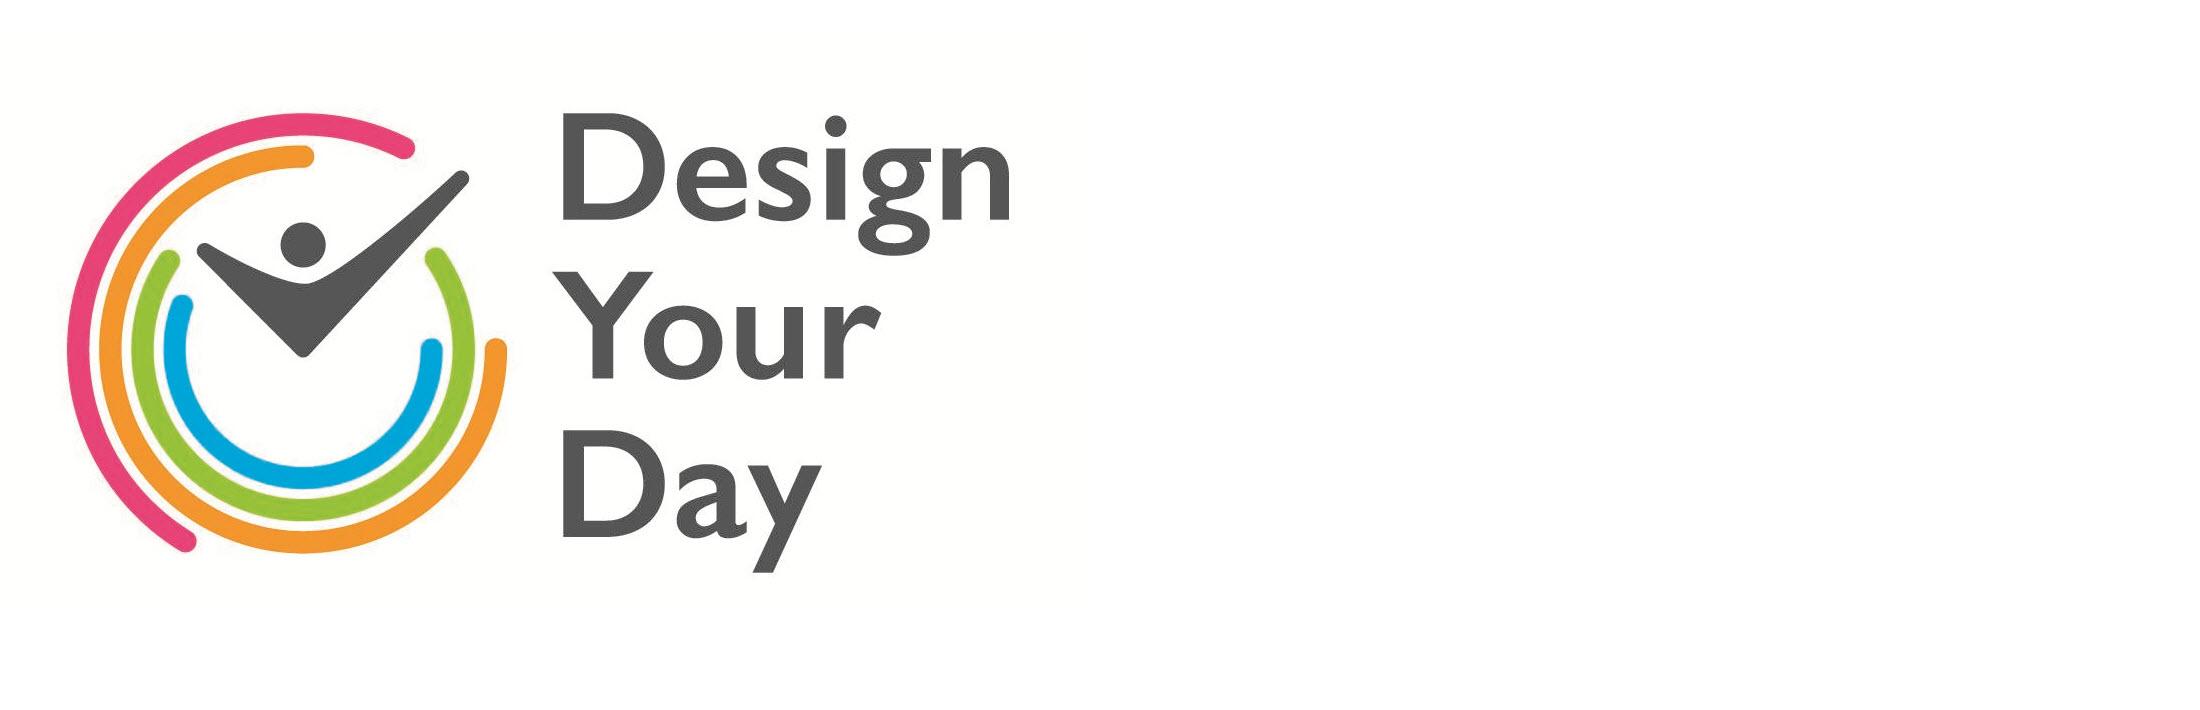 """Design Your Day"" at Boehringer Ingelheim Japan"